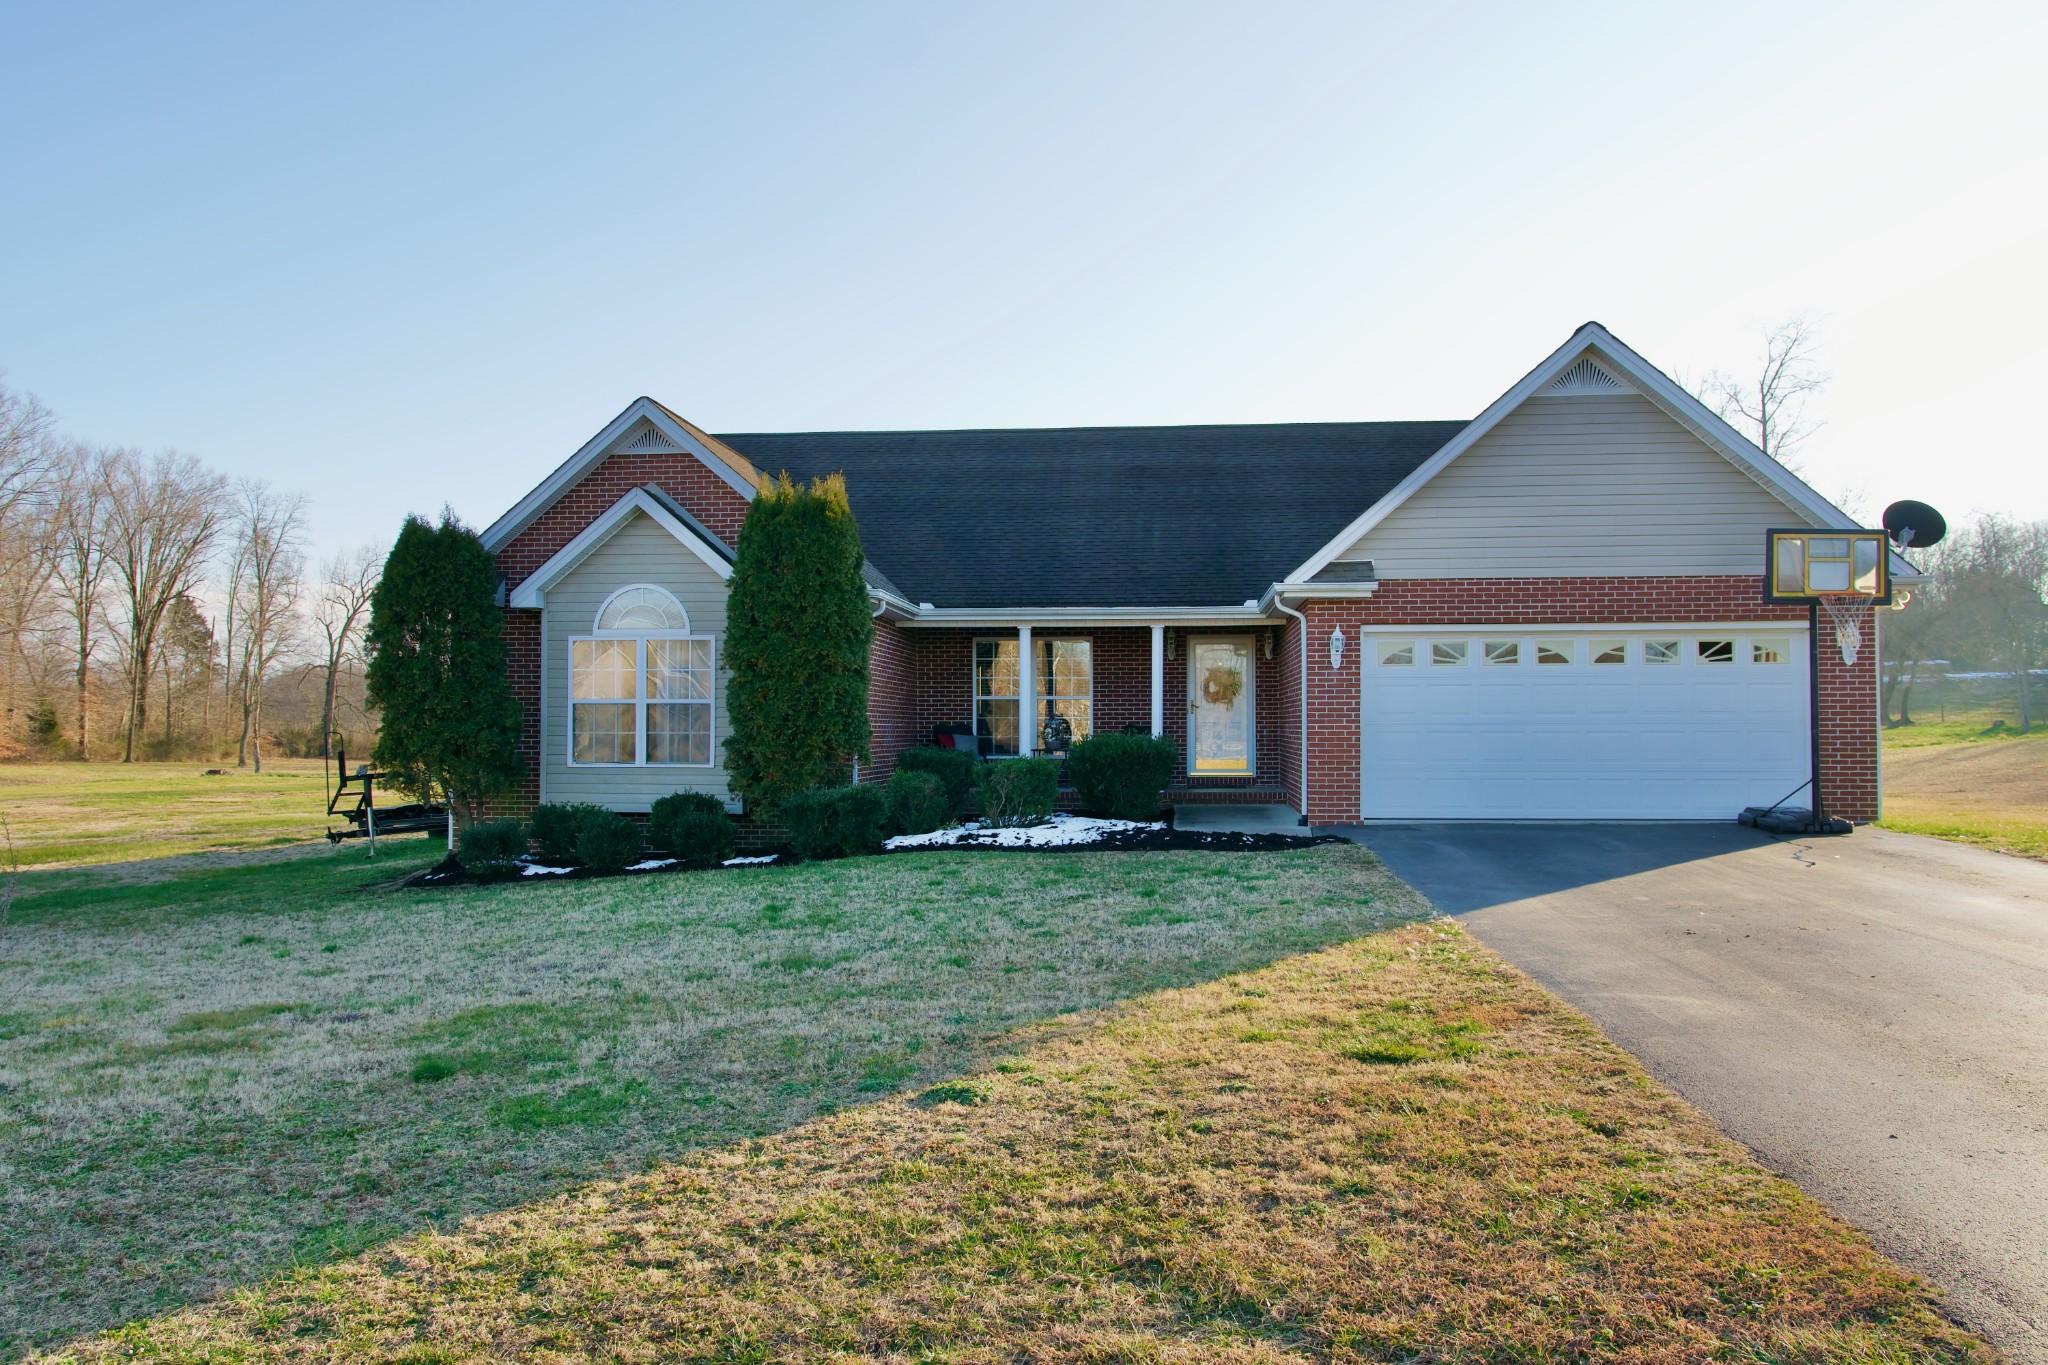 3146 Kave Dr Property Photo - Cookeville, TN real estate listing